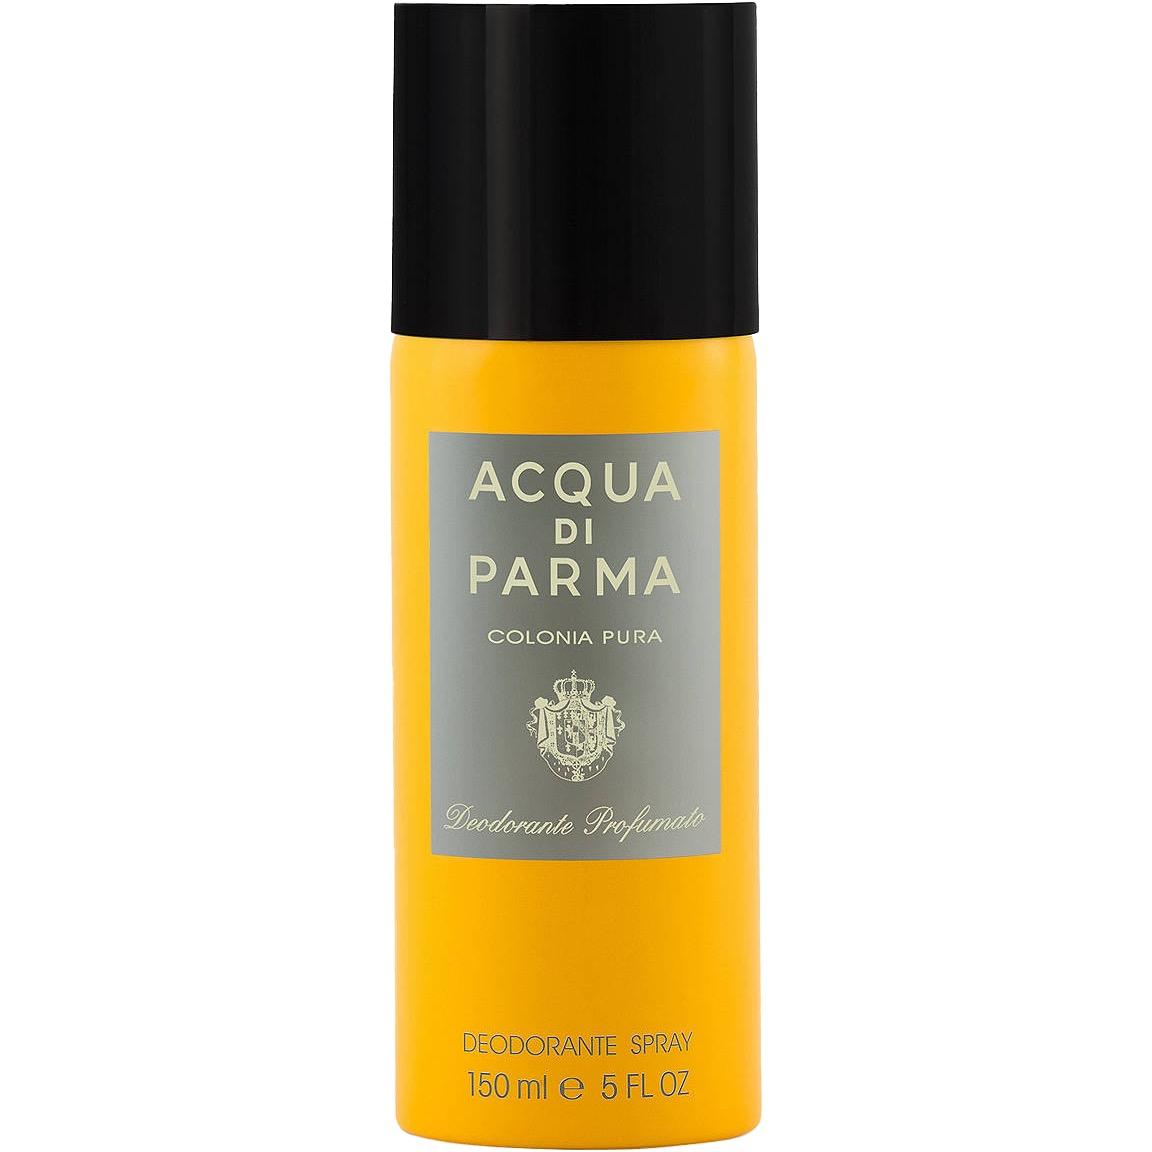 Deodorant Spray - Colonia Pura